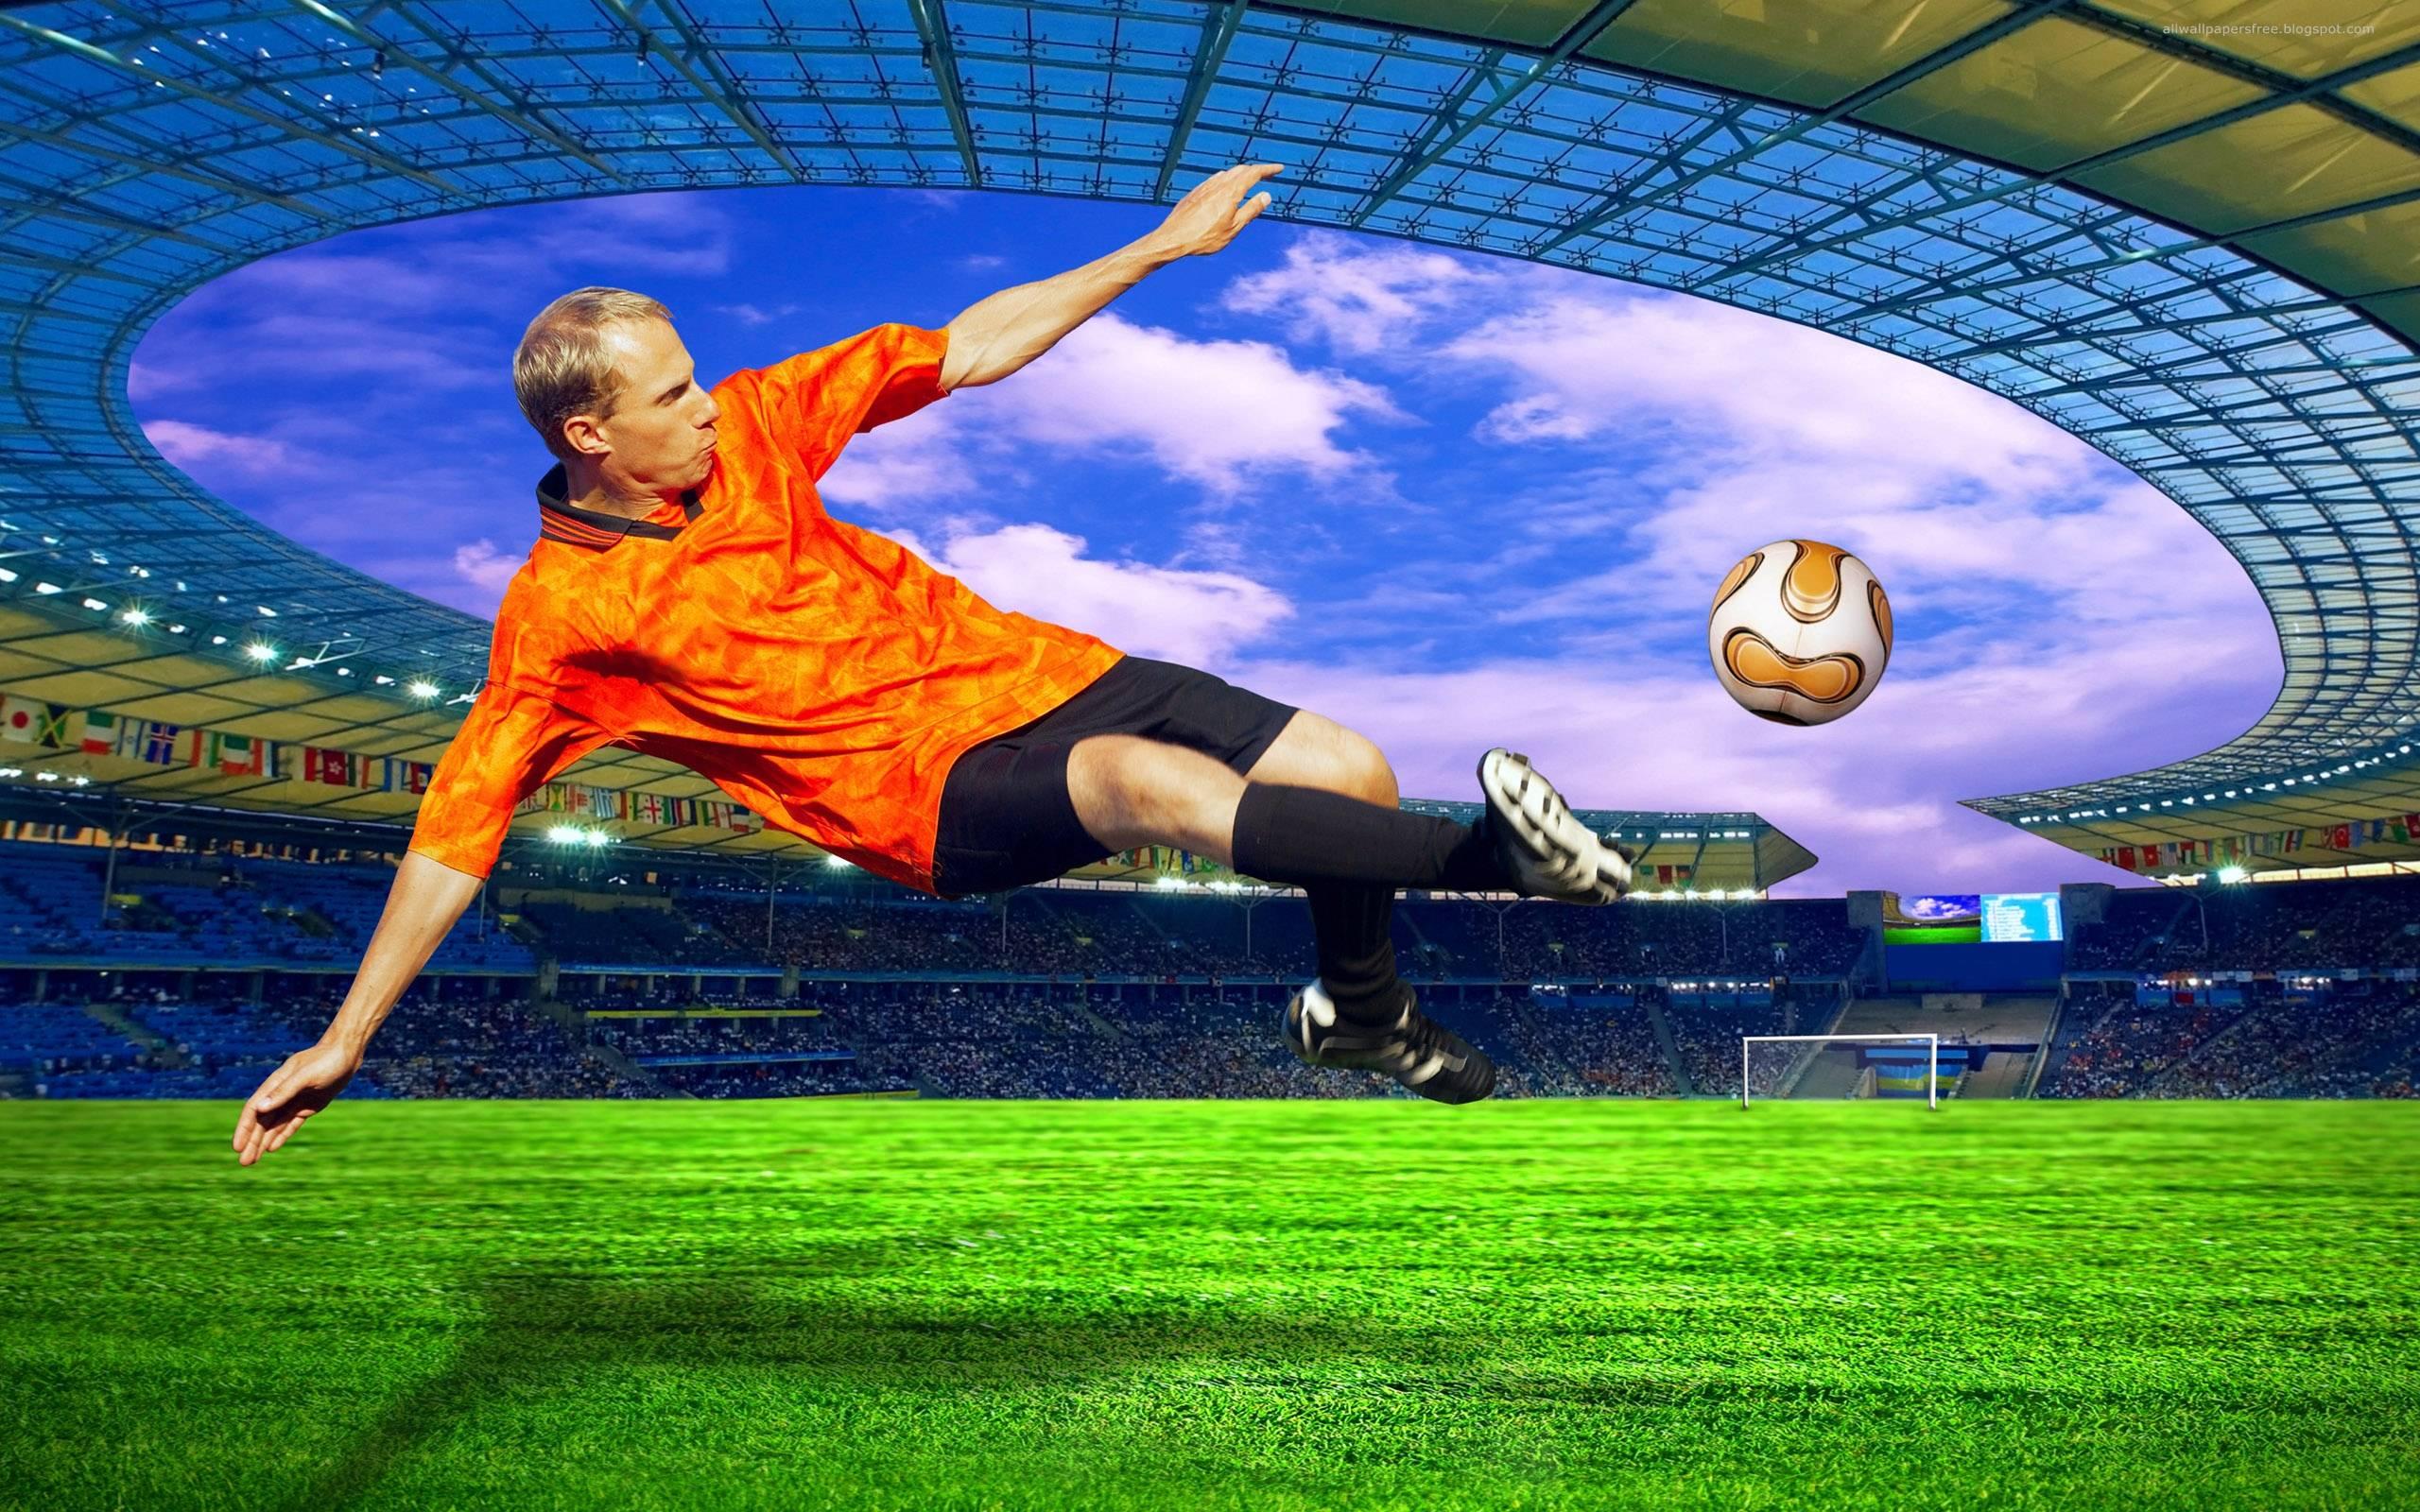 Sports Design Wallpaper Hd: HD Football Wallpapers